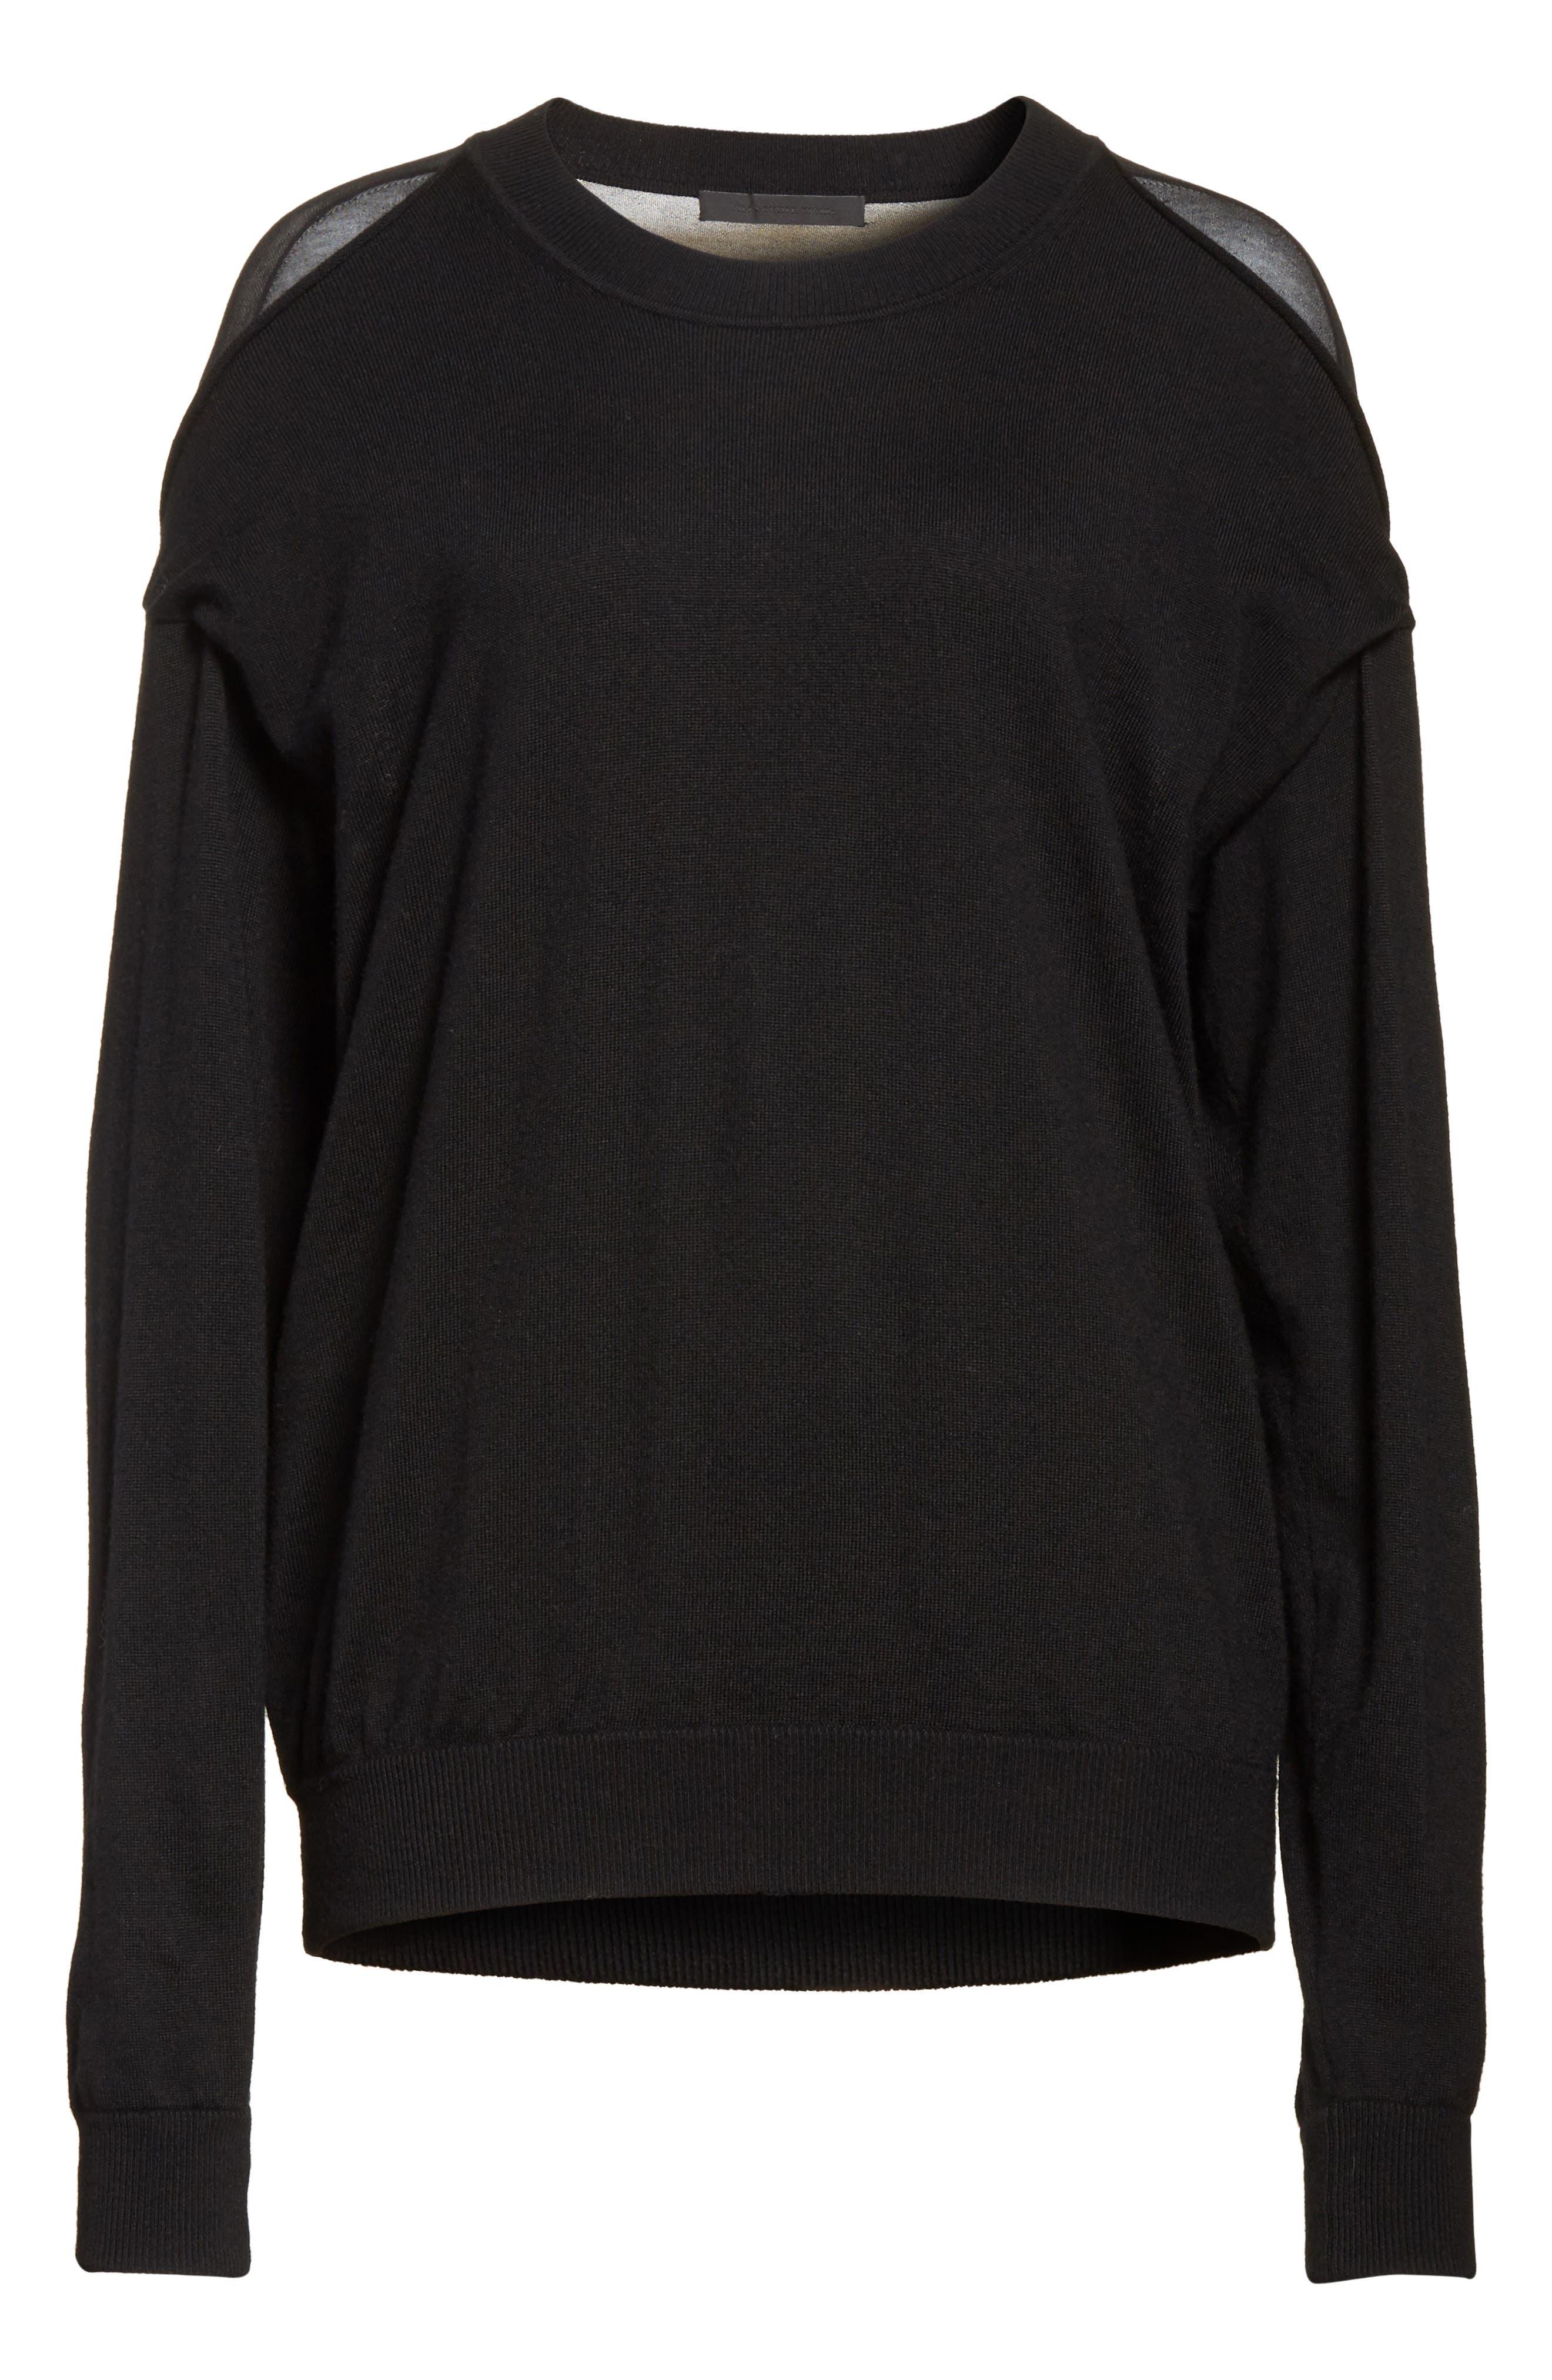 Drape Back Merino Wool Sweater,                             Alternate thumbnail 6, color,                             Black